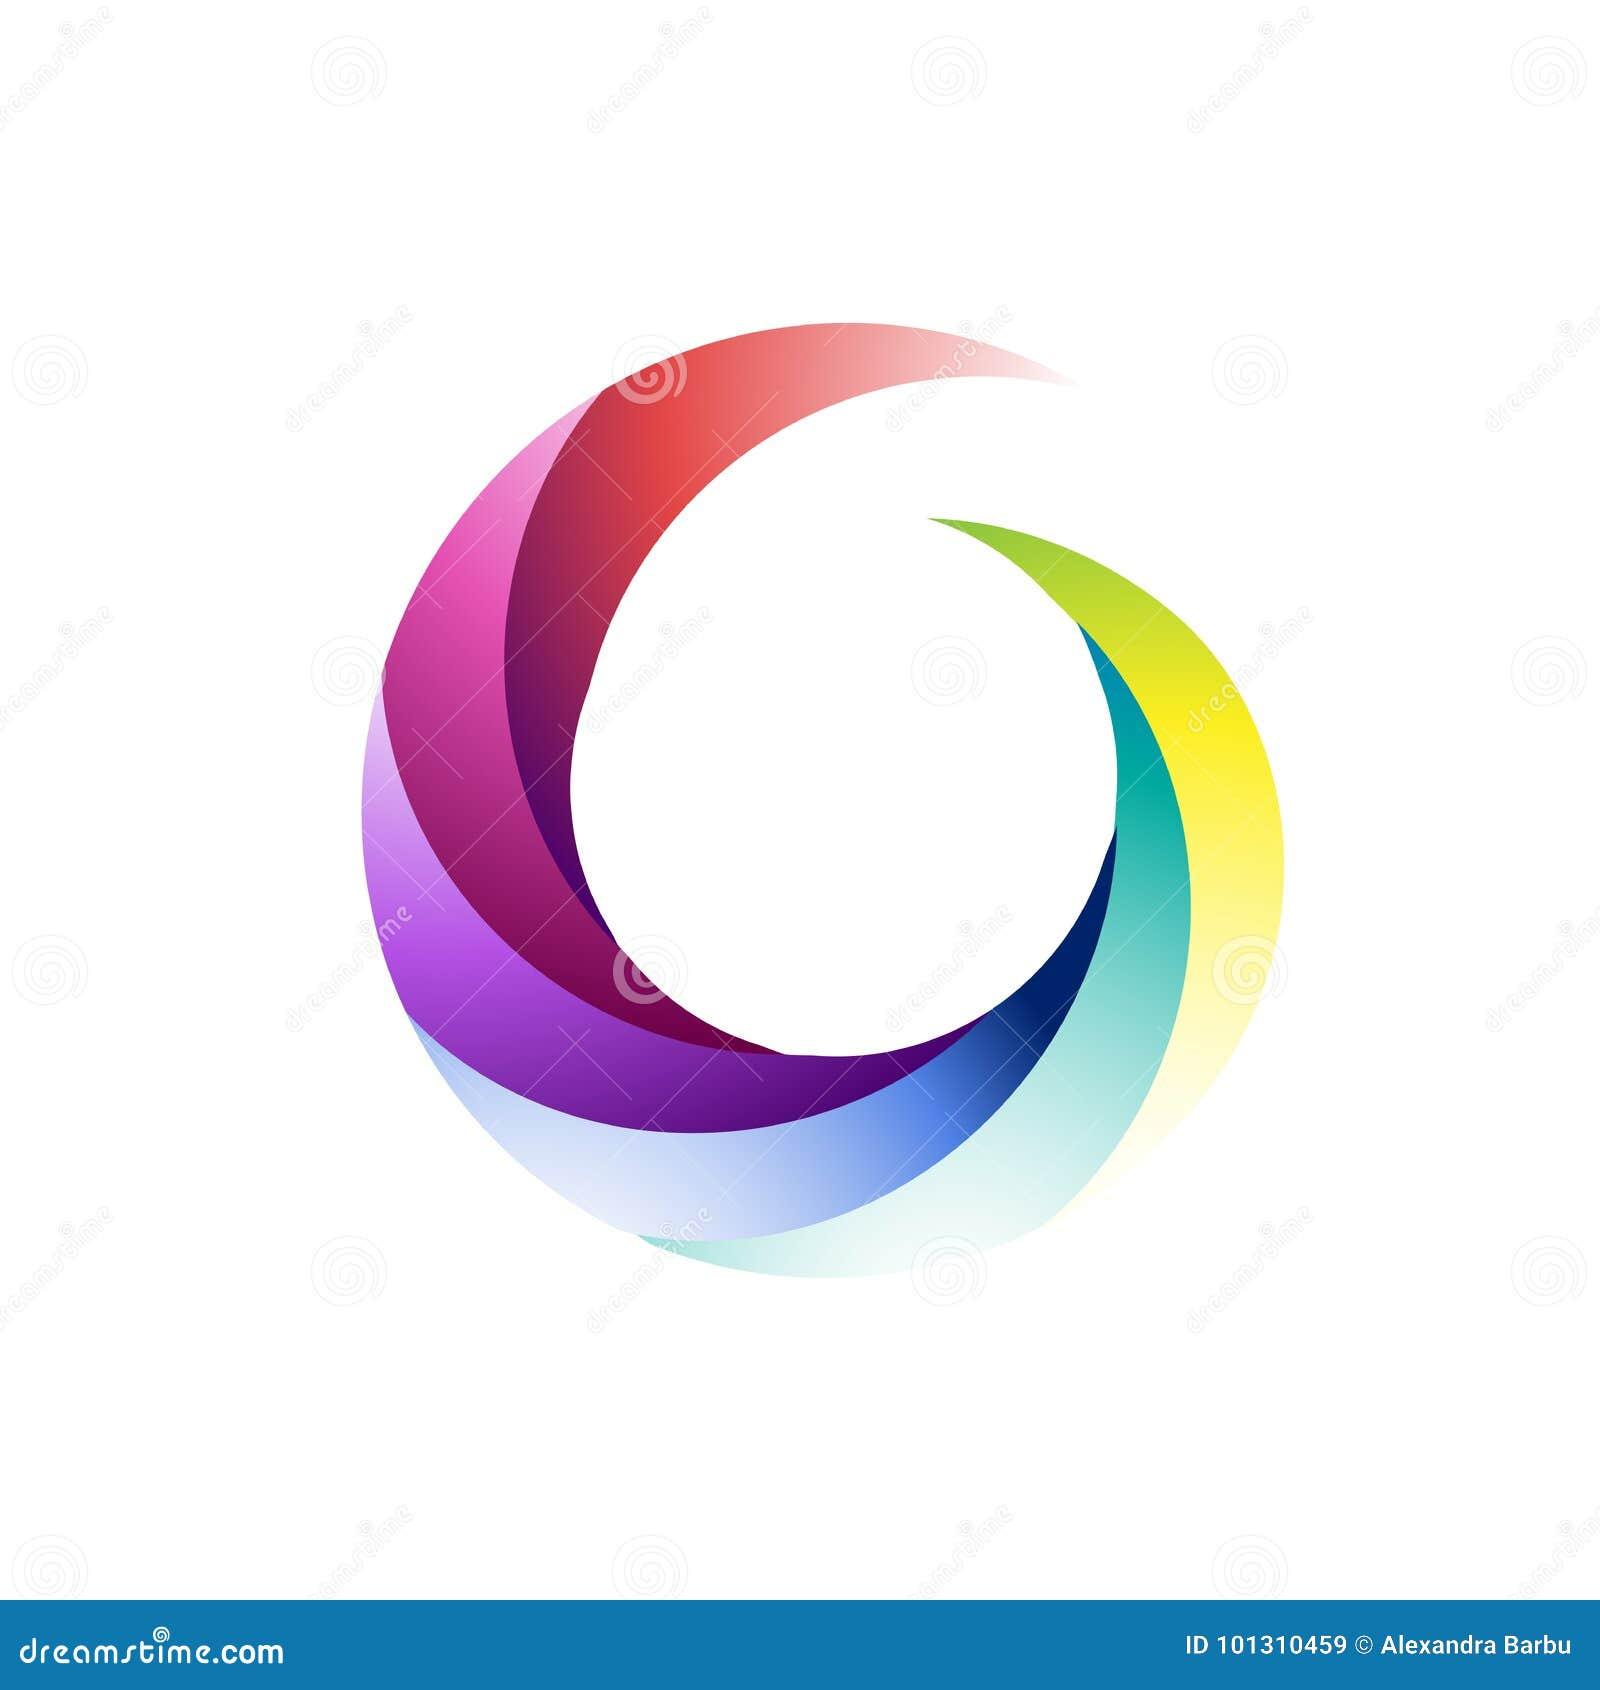 abstract circle spiral logo multicolor sphere stock vector rh dreamstime com free vector download business card free download vector business card design